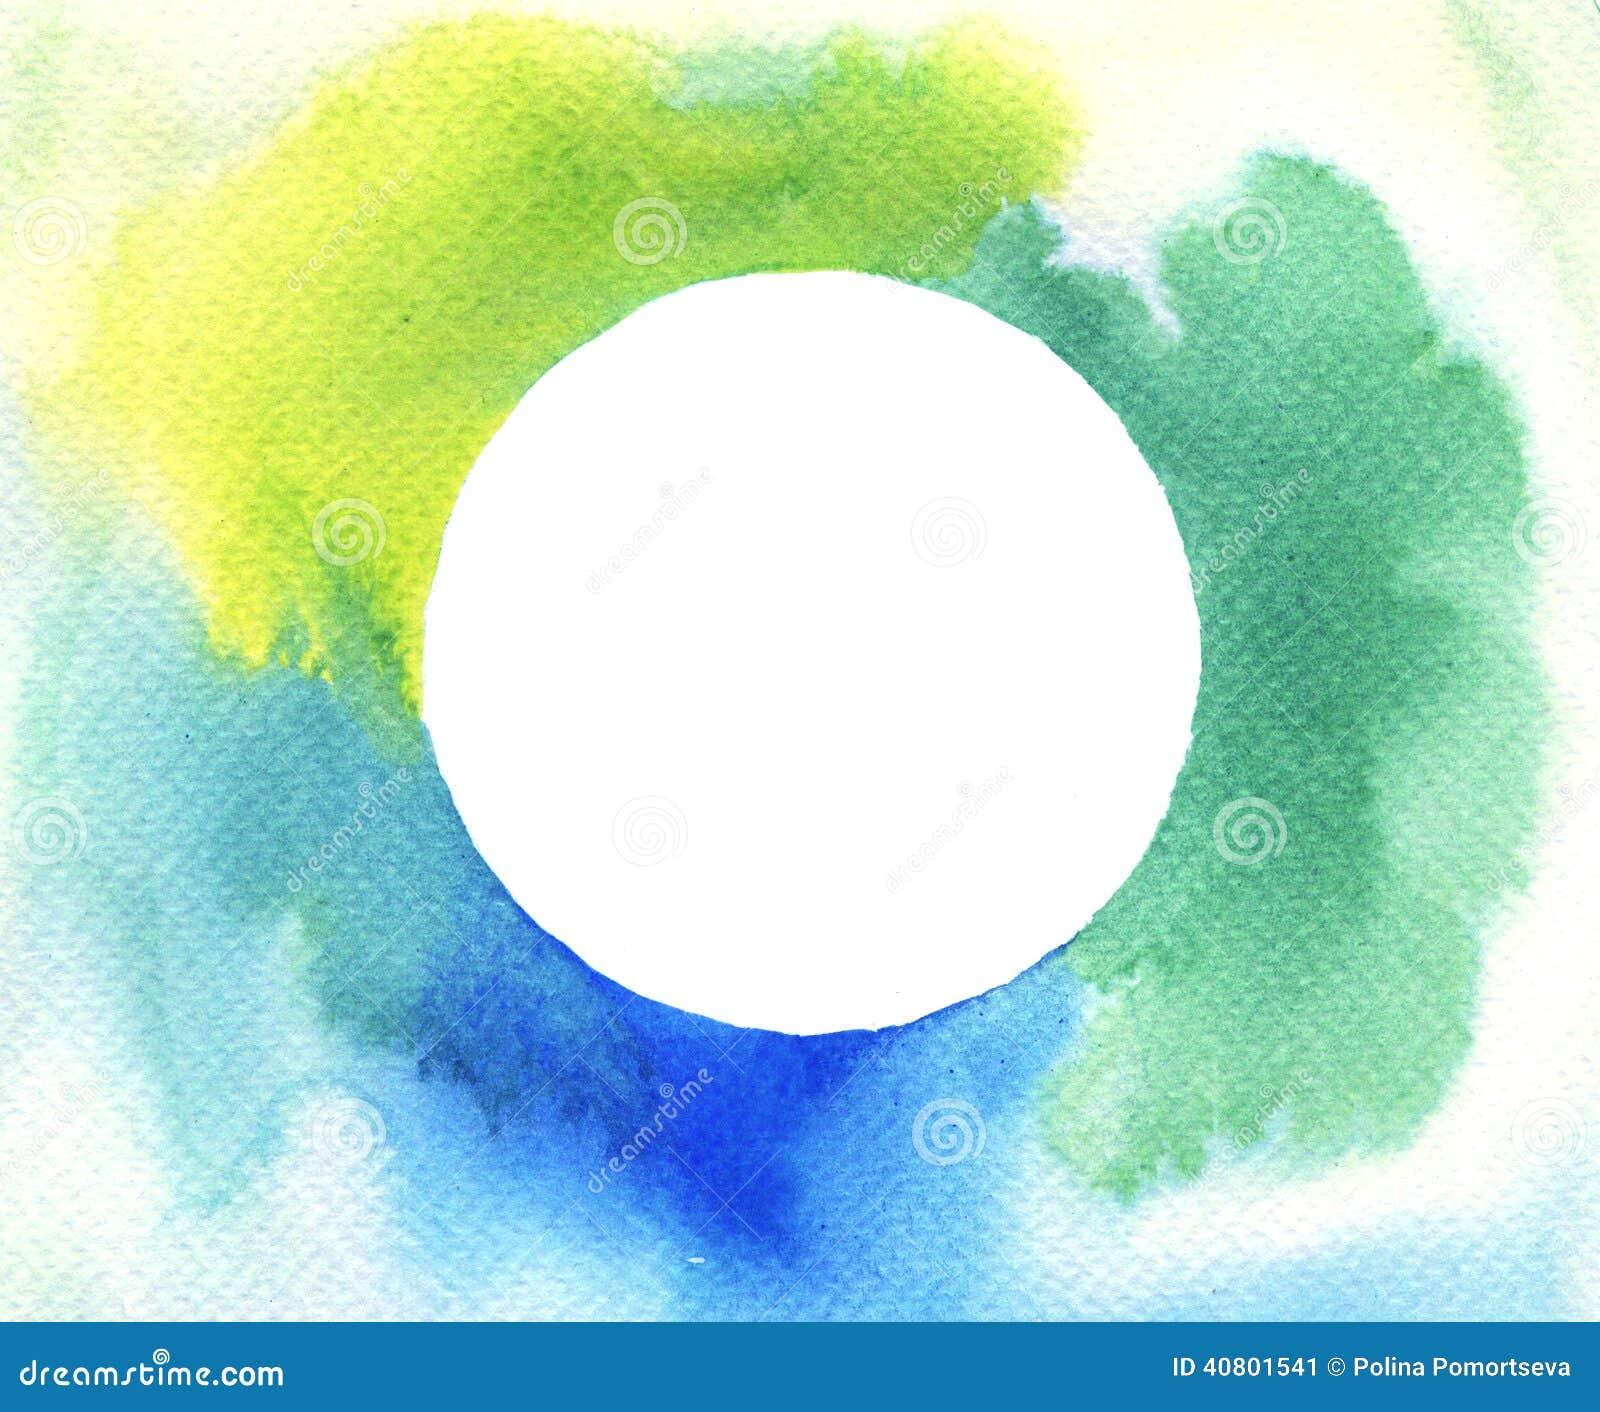 Watercolor Circle Frame Background Illustration 40801541 - Megapixl